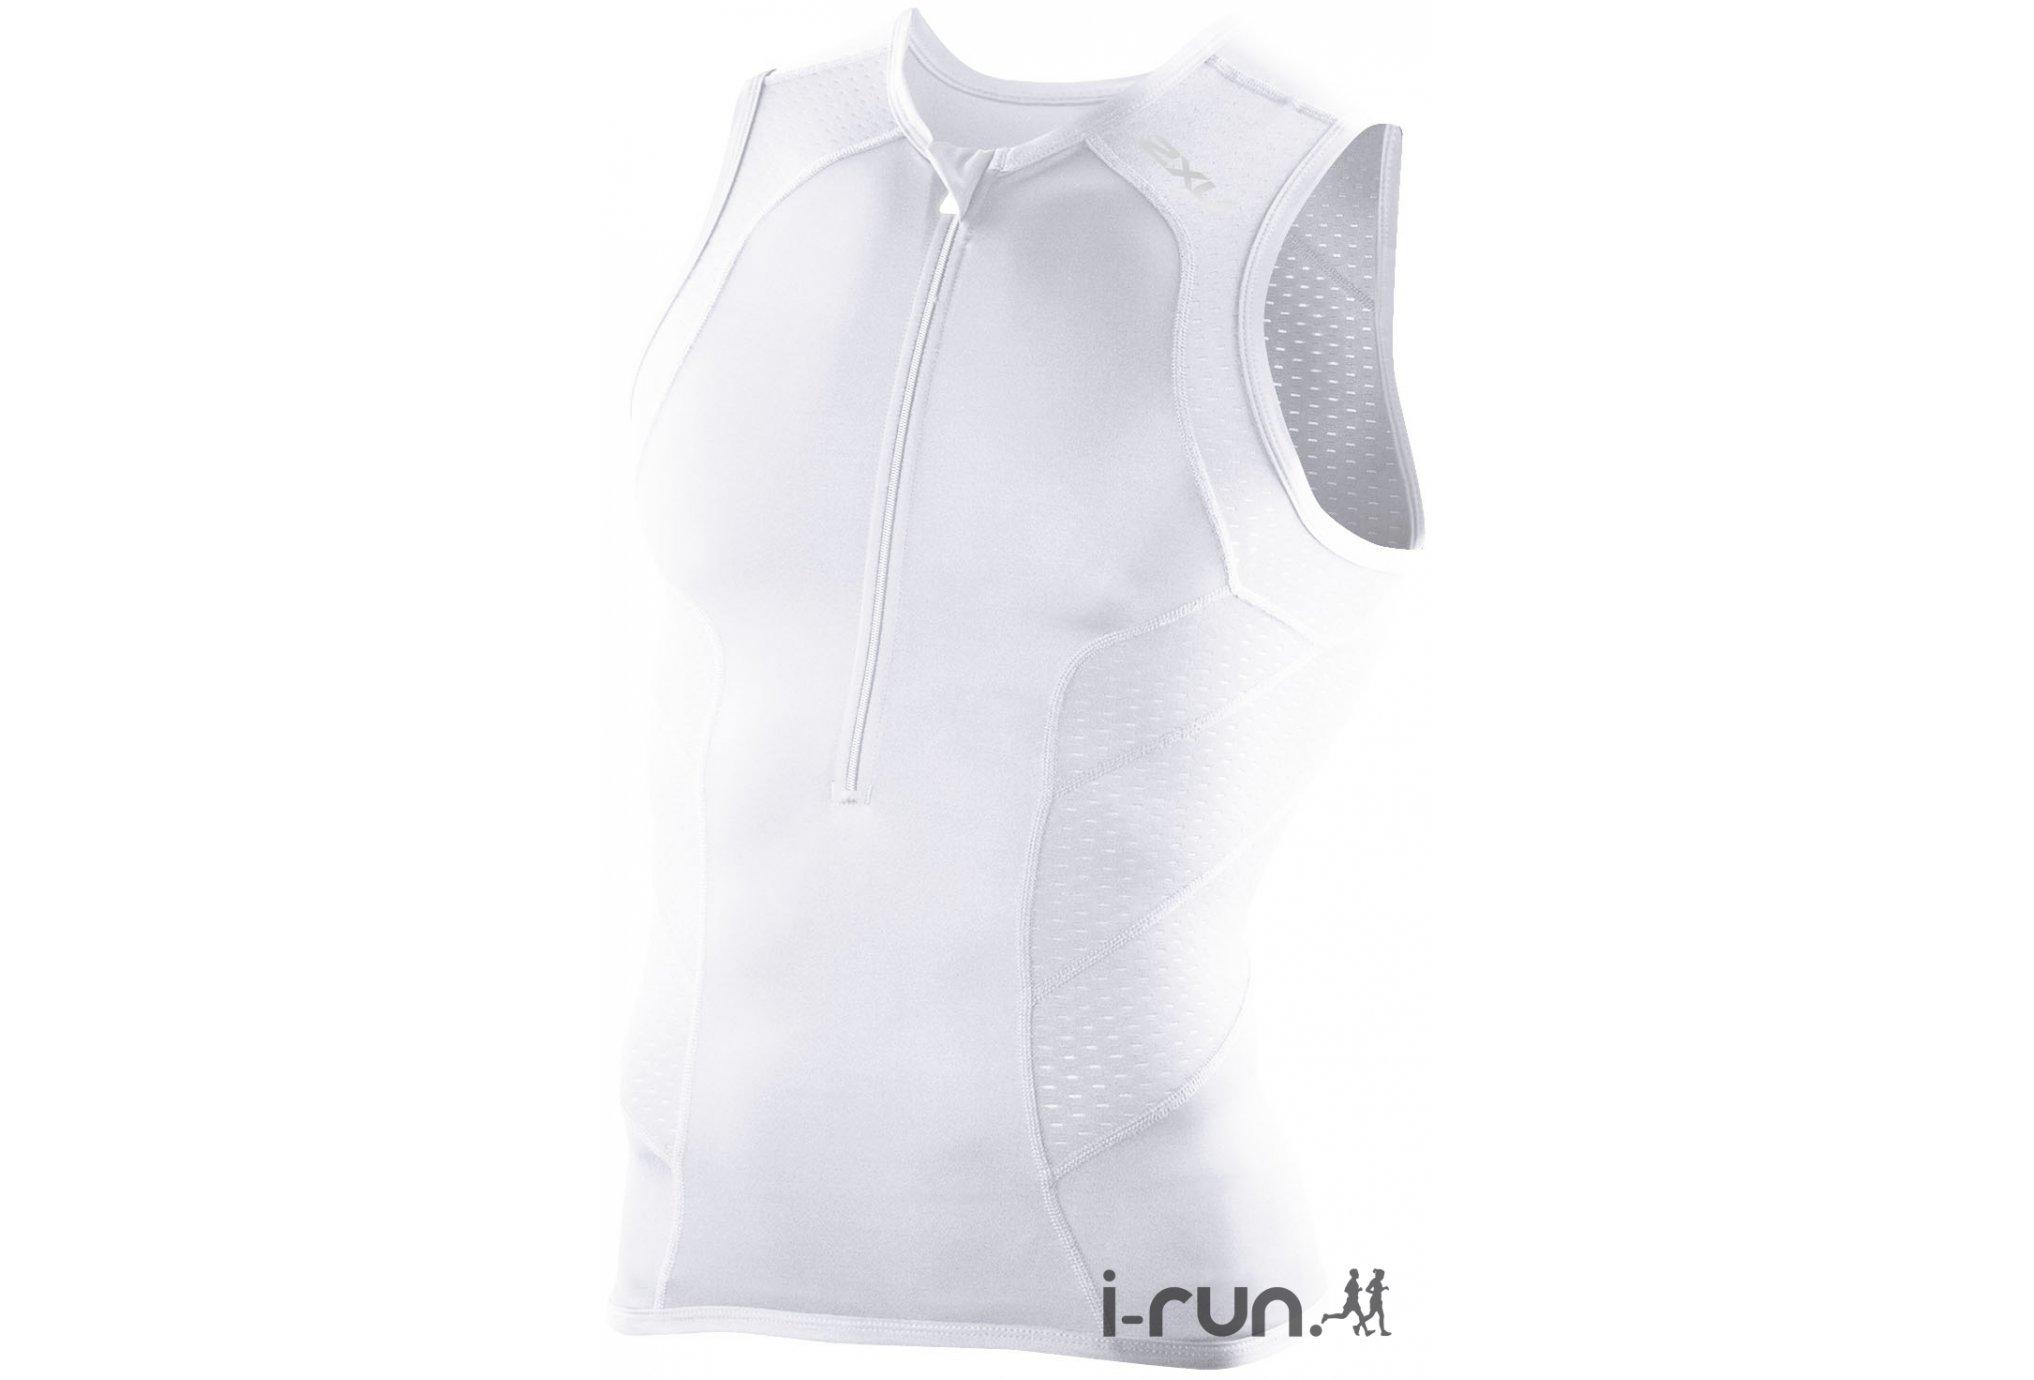 2xu Maillot perform tri m vêtement running homme